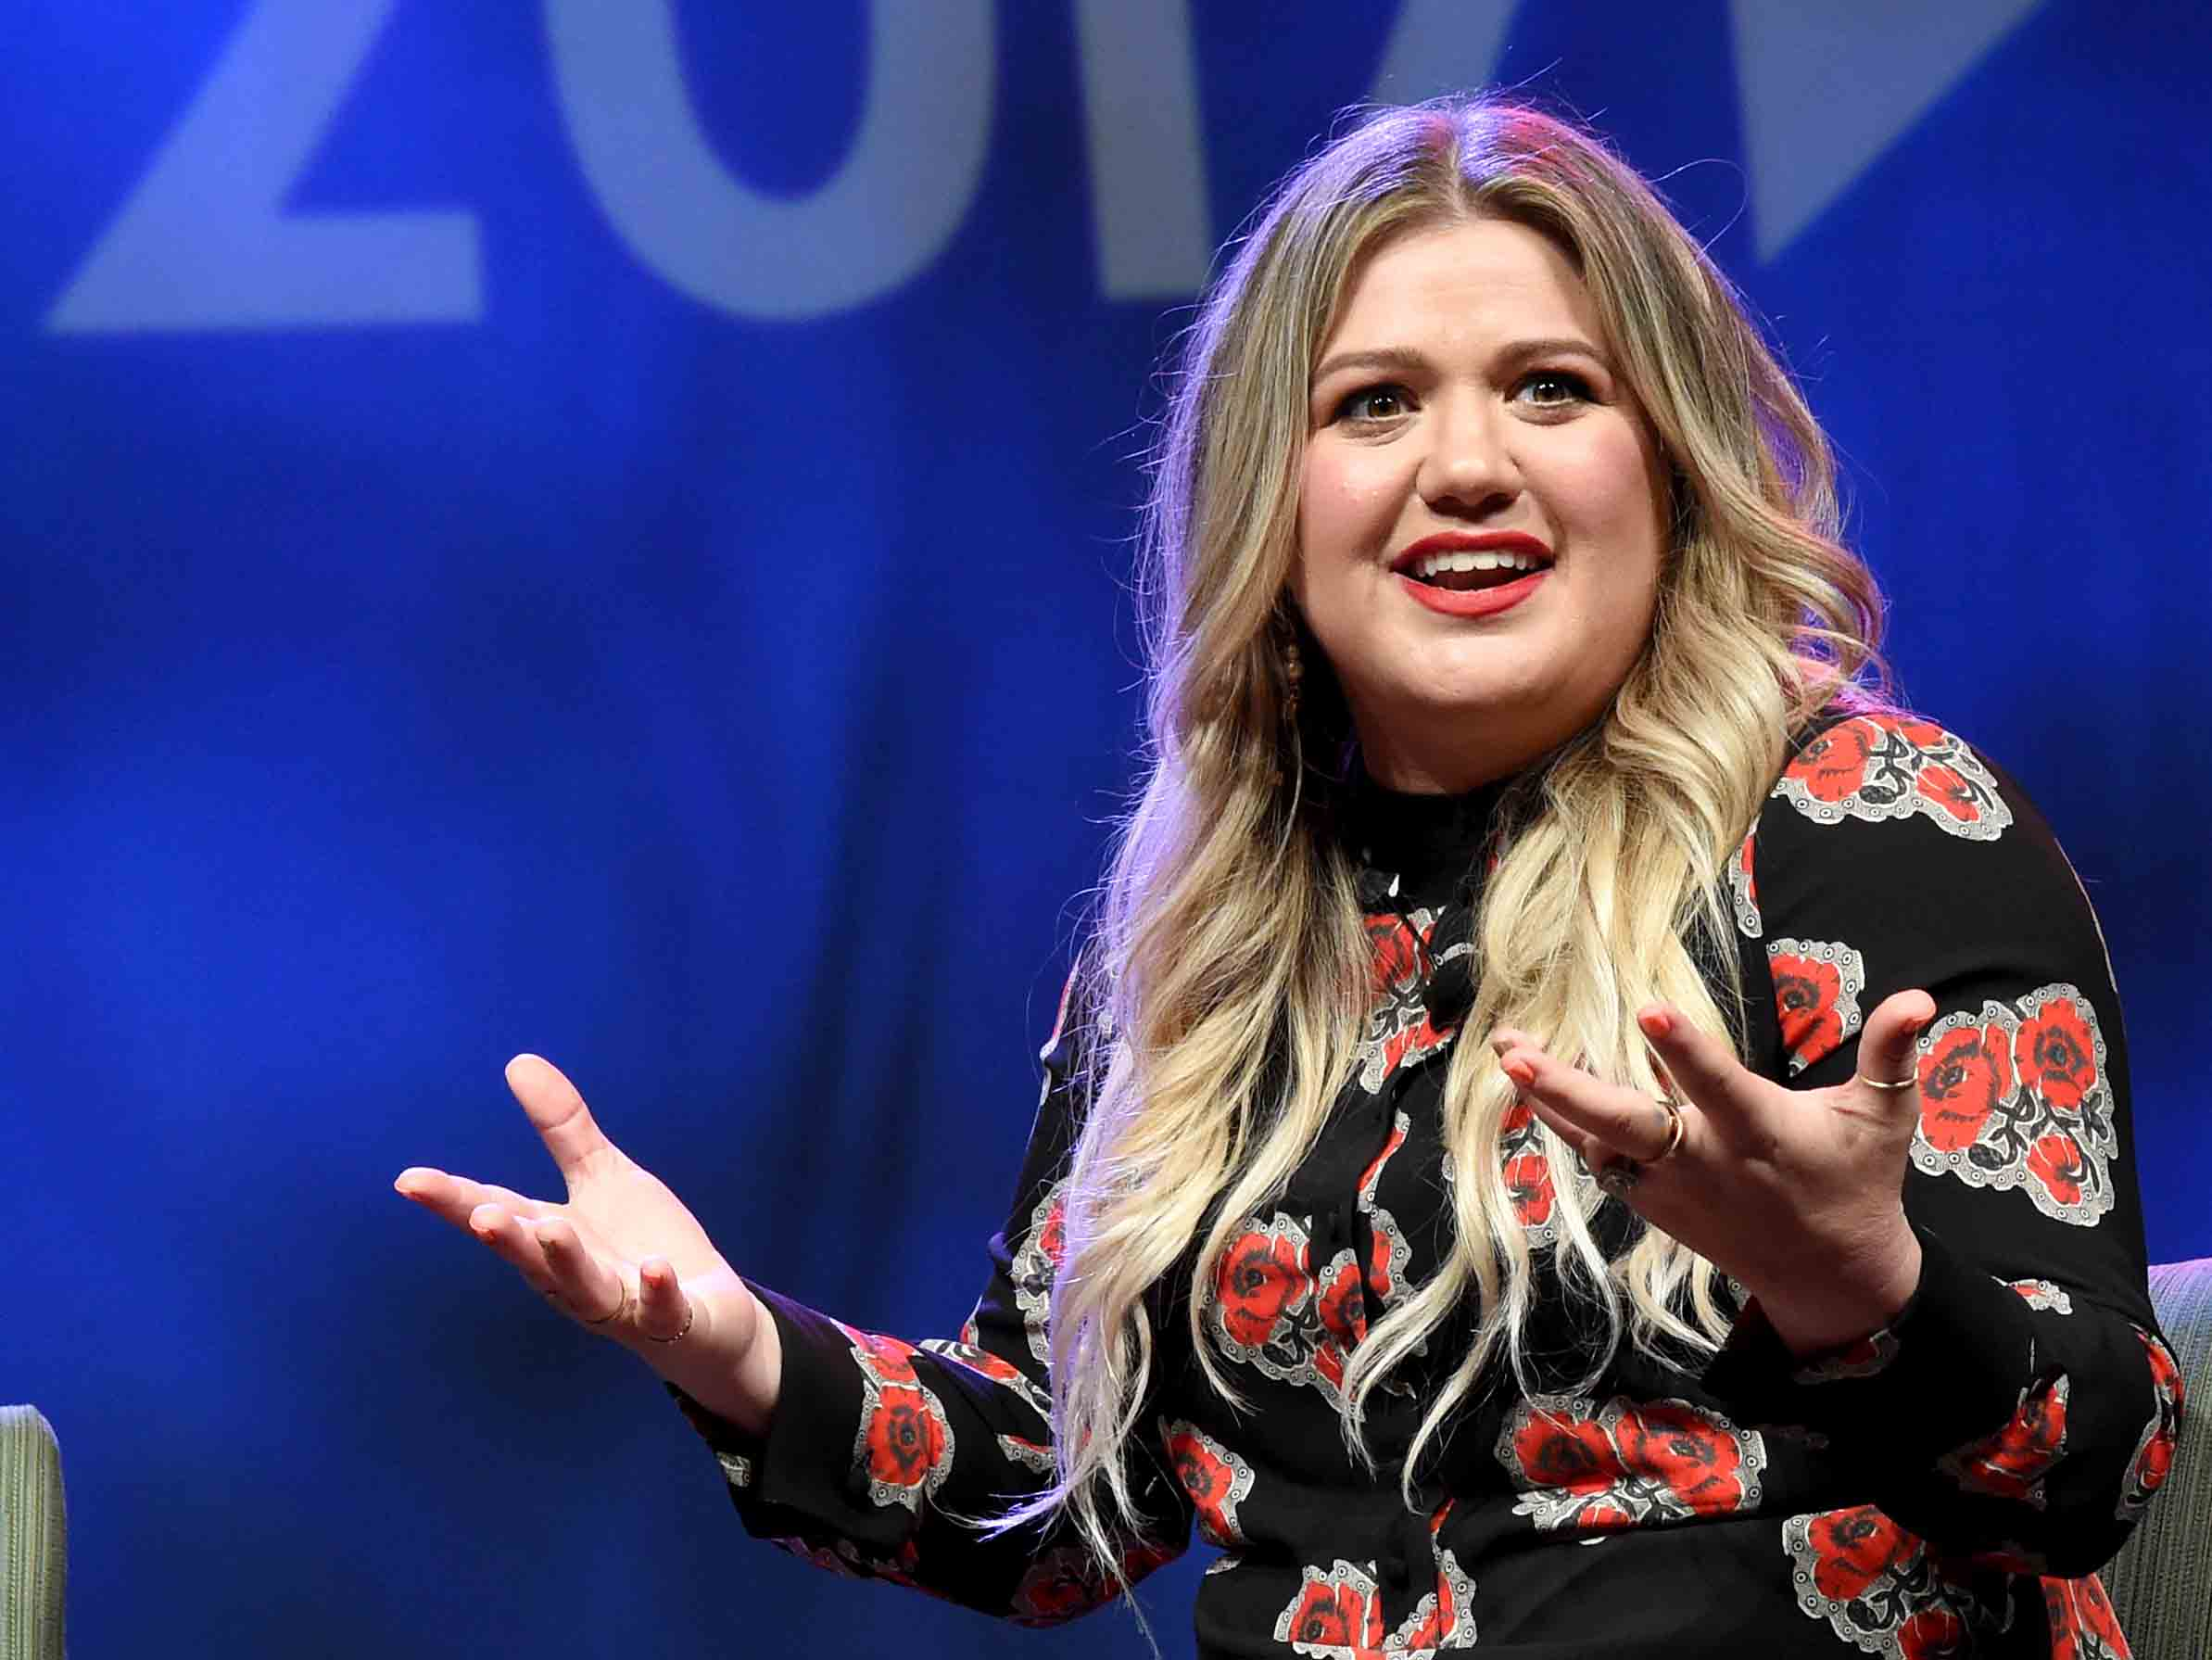 Diejek Gendut di Twitter, Begini Respon 'Santai' Kelly Clarkson